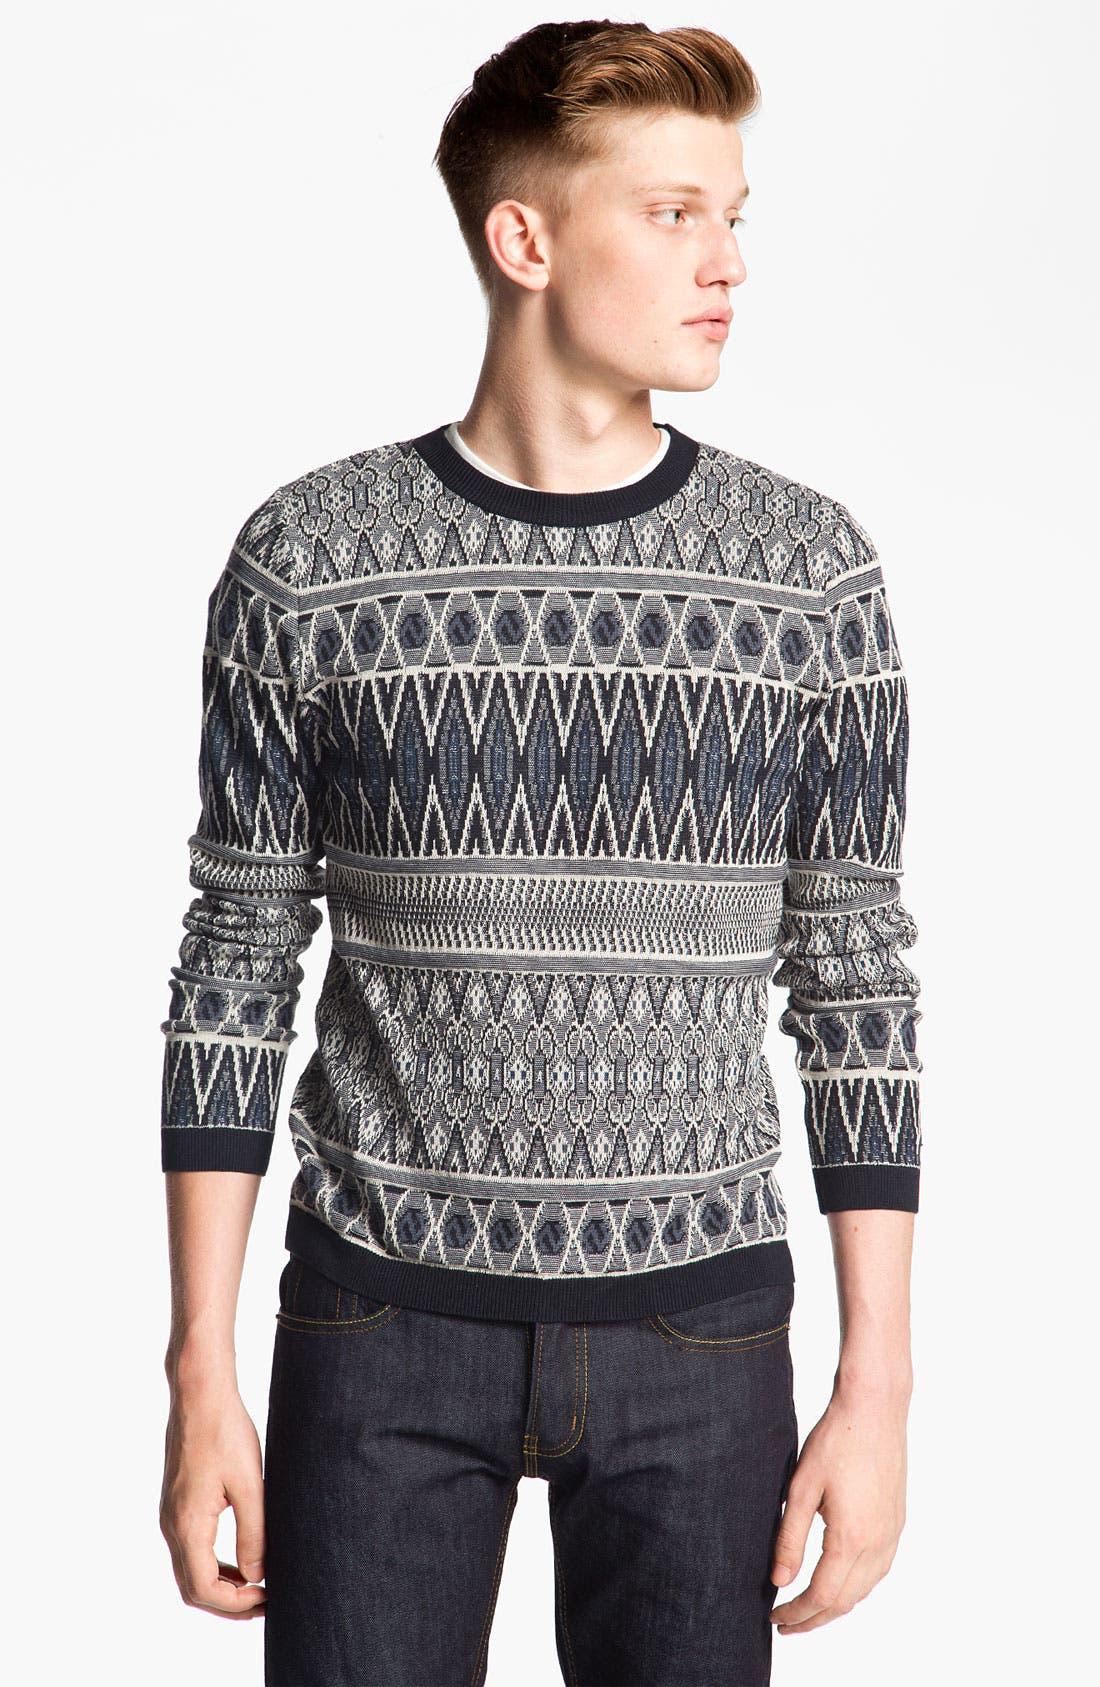 Alternate Image 1 Selected - Topman Tapestry Print Knit Crewneck Sweater